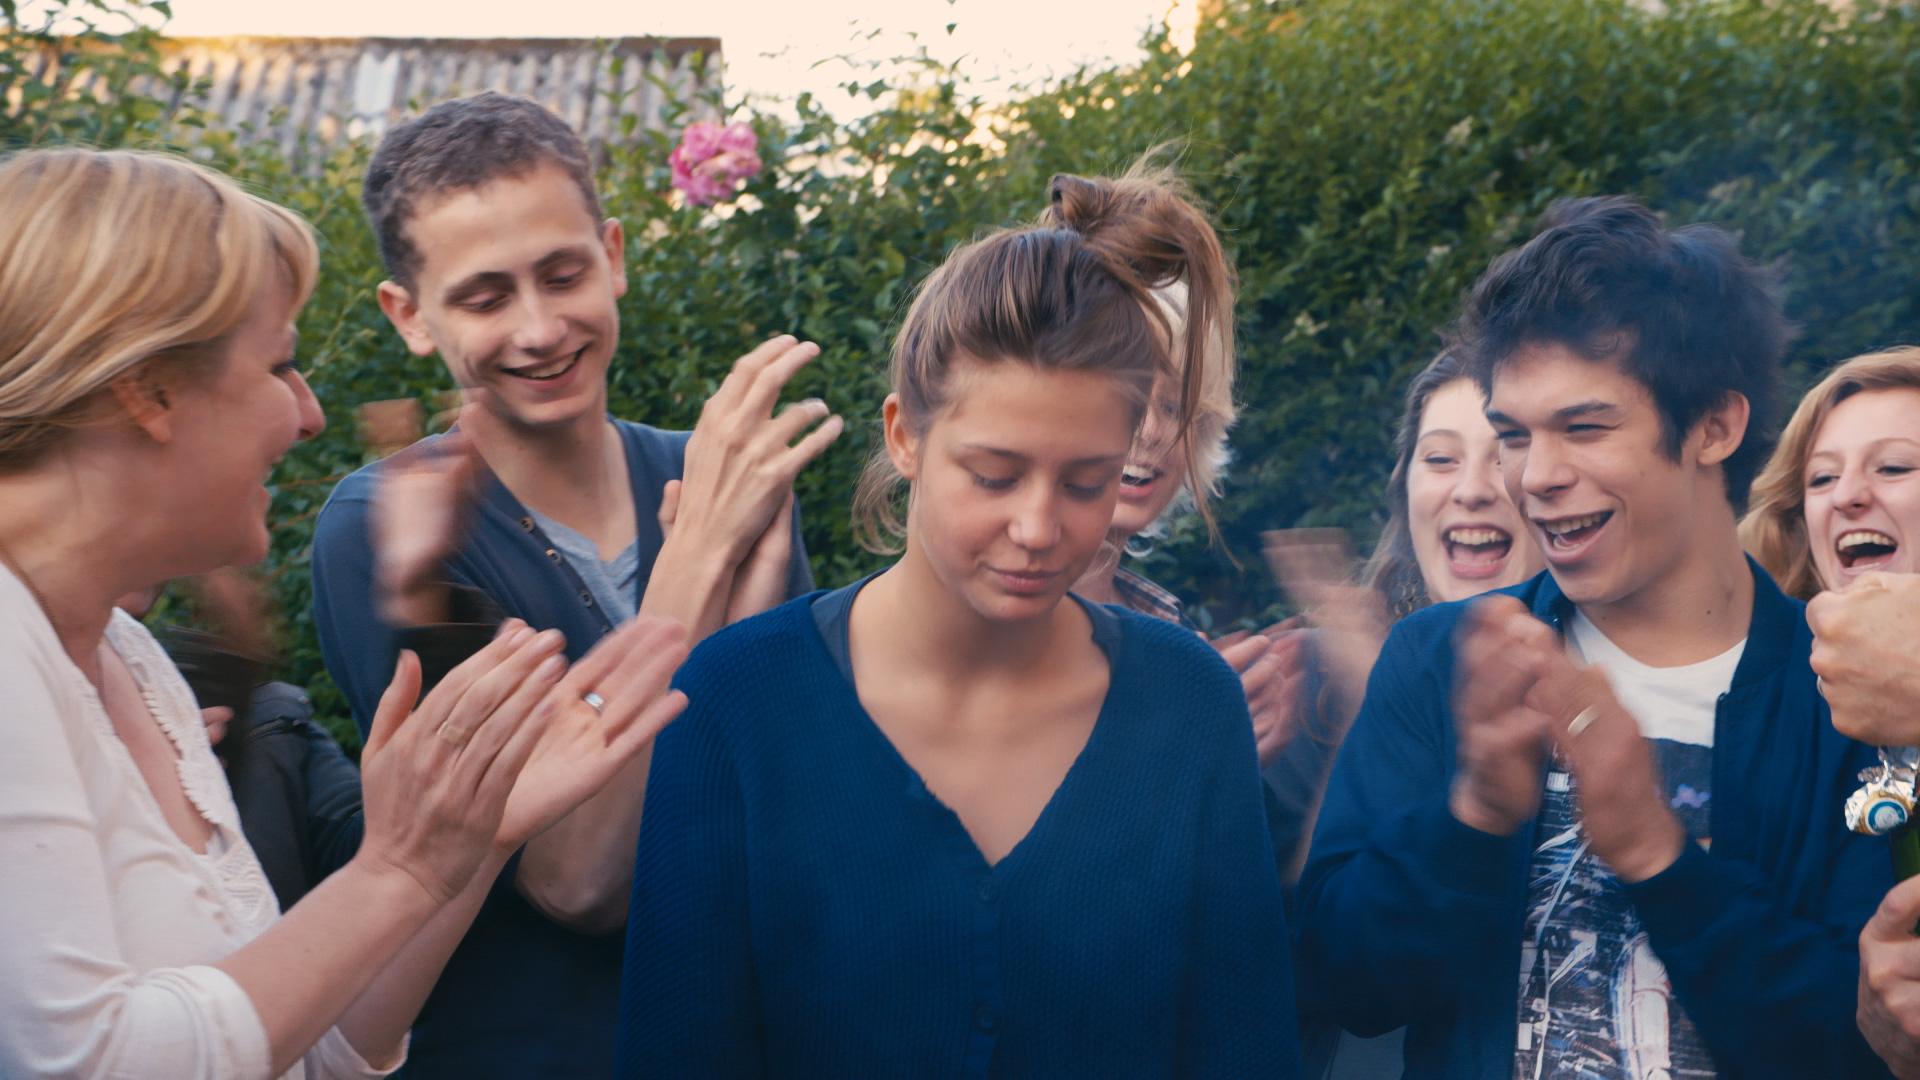 c934b606 Adèle Exarchopoulos (Adele) omkranset av medelever i Blå er den varmeste  fargen (Foto: Arthaus).